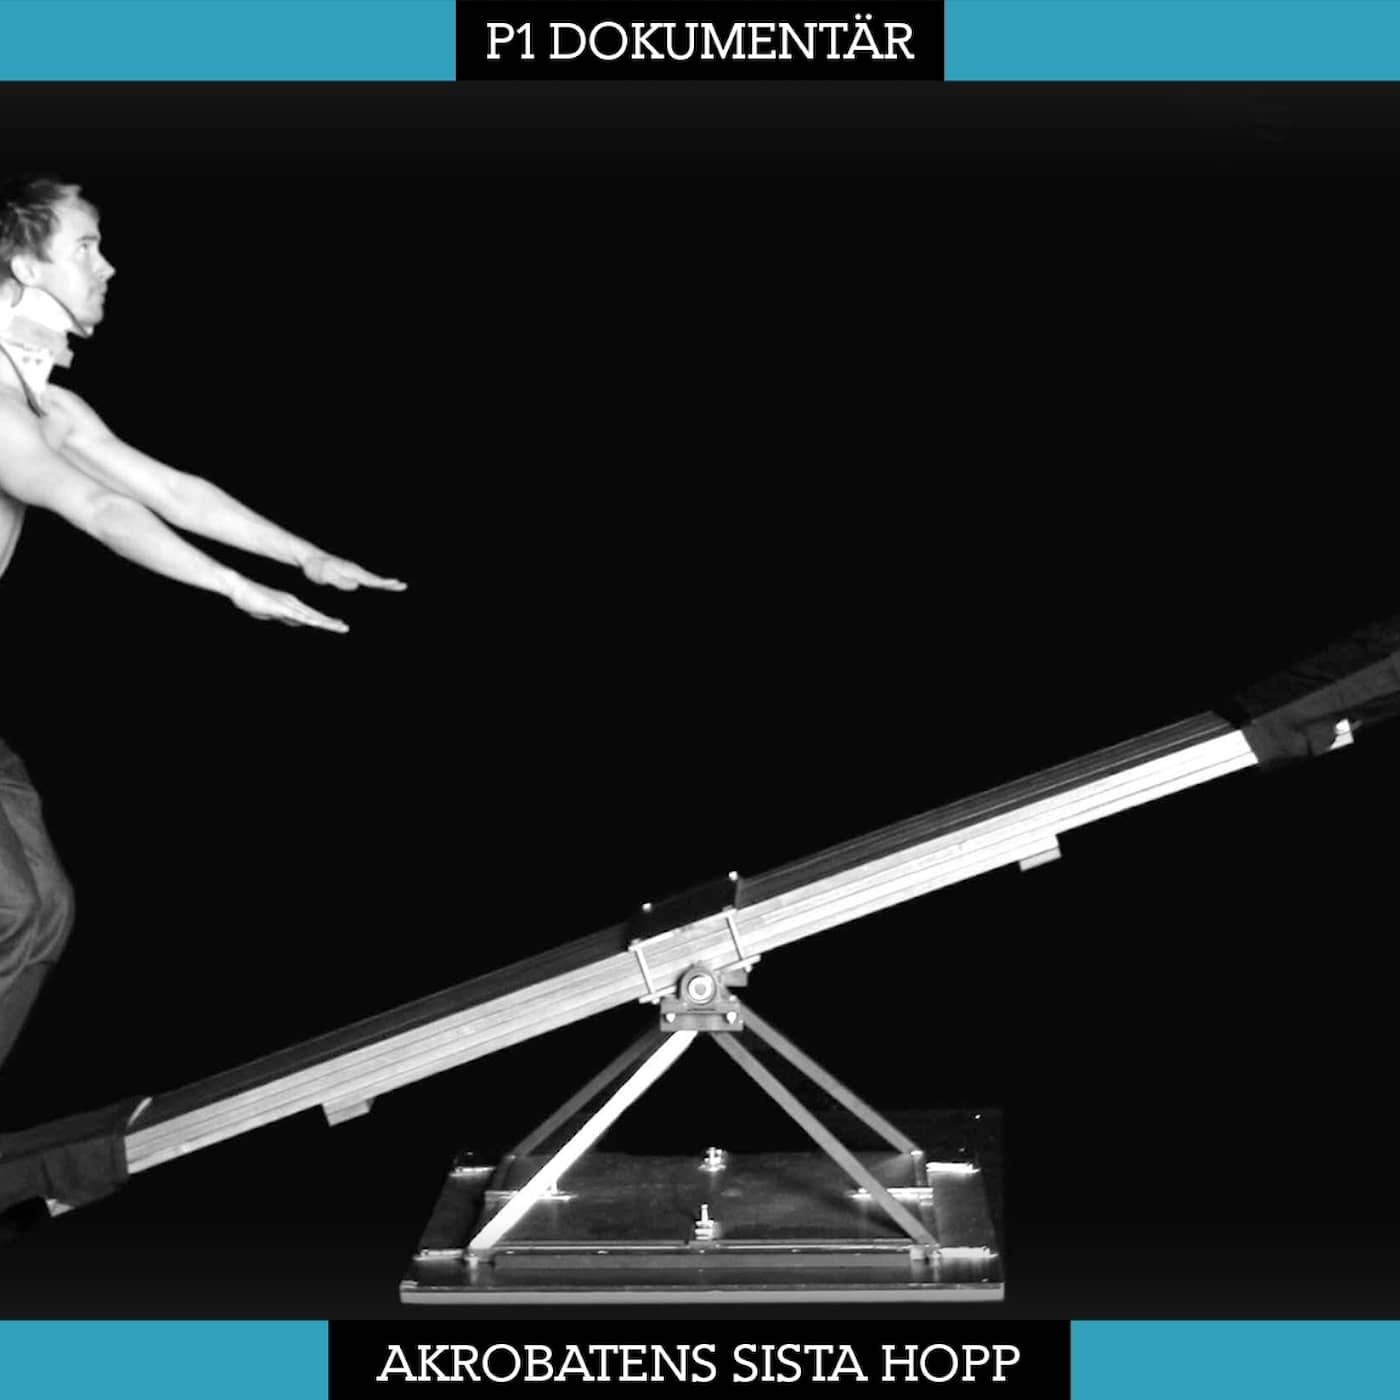 Akrobatens sista hopp (R)